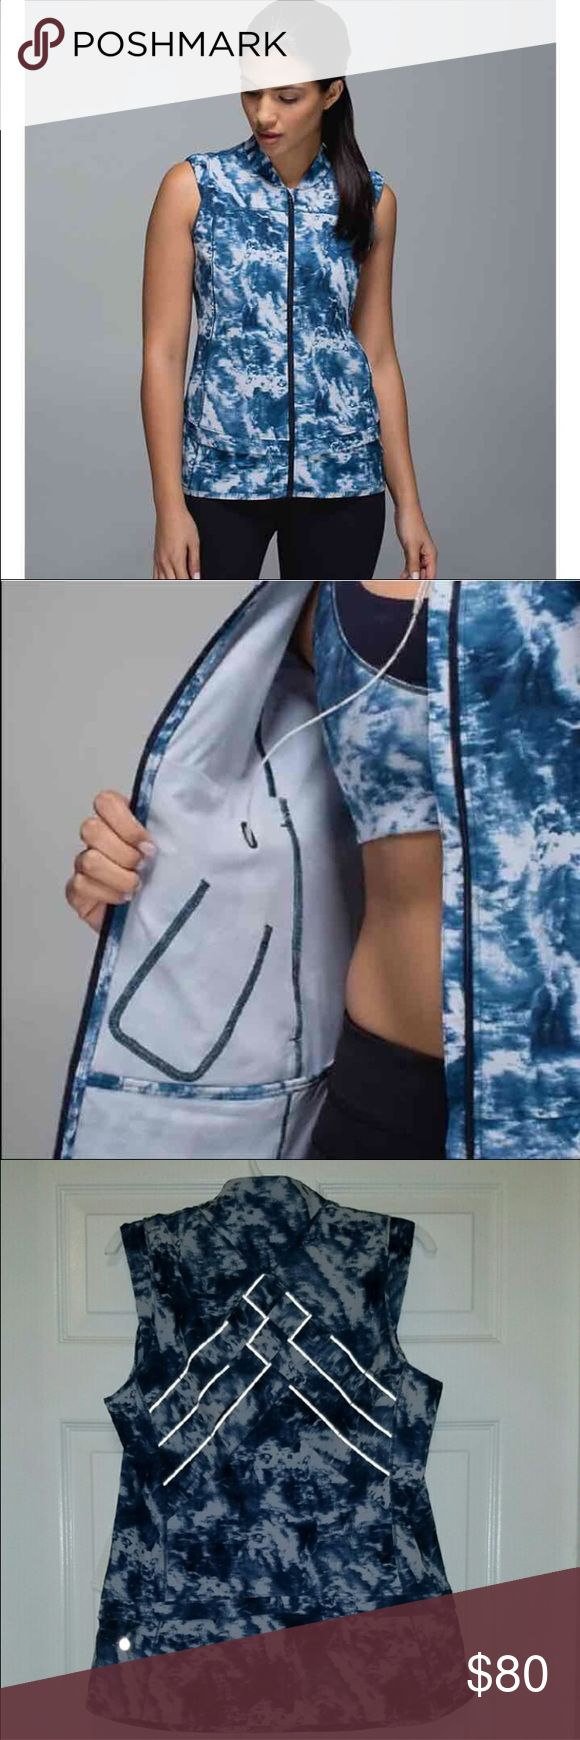 NEW LULULEMON Vest NEW with tags. Size 8. Reflective detailing lululemon athletica Jackets & Coats Vests